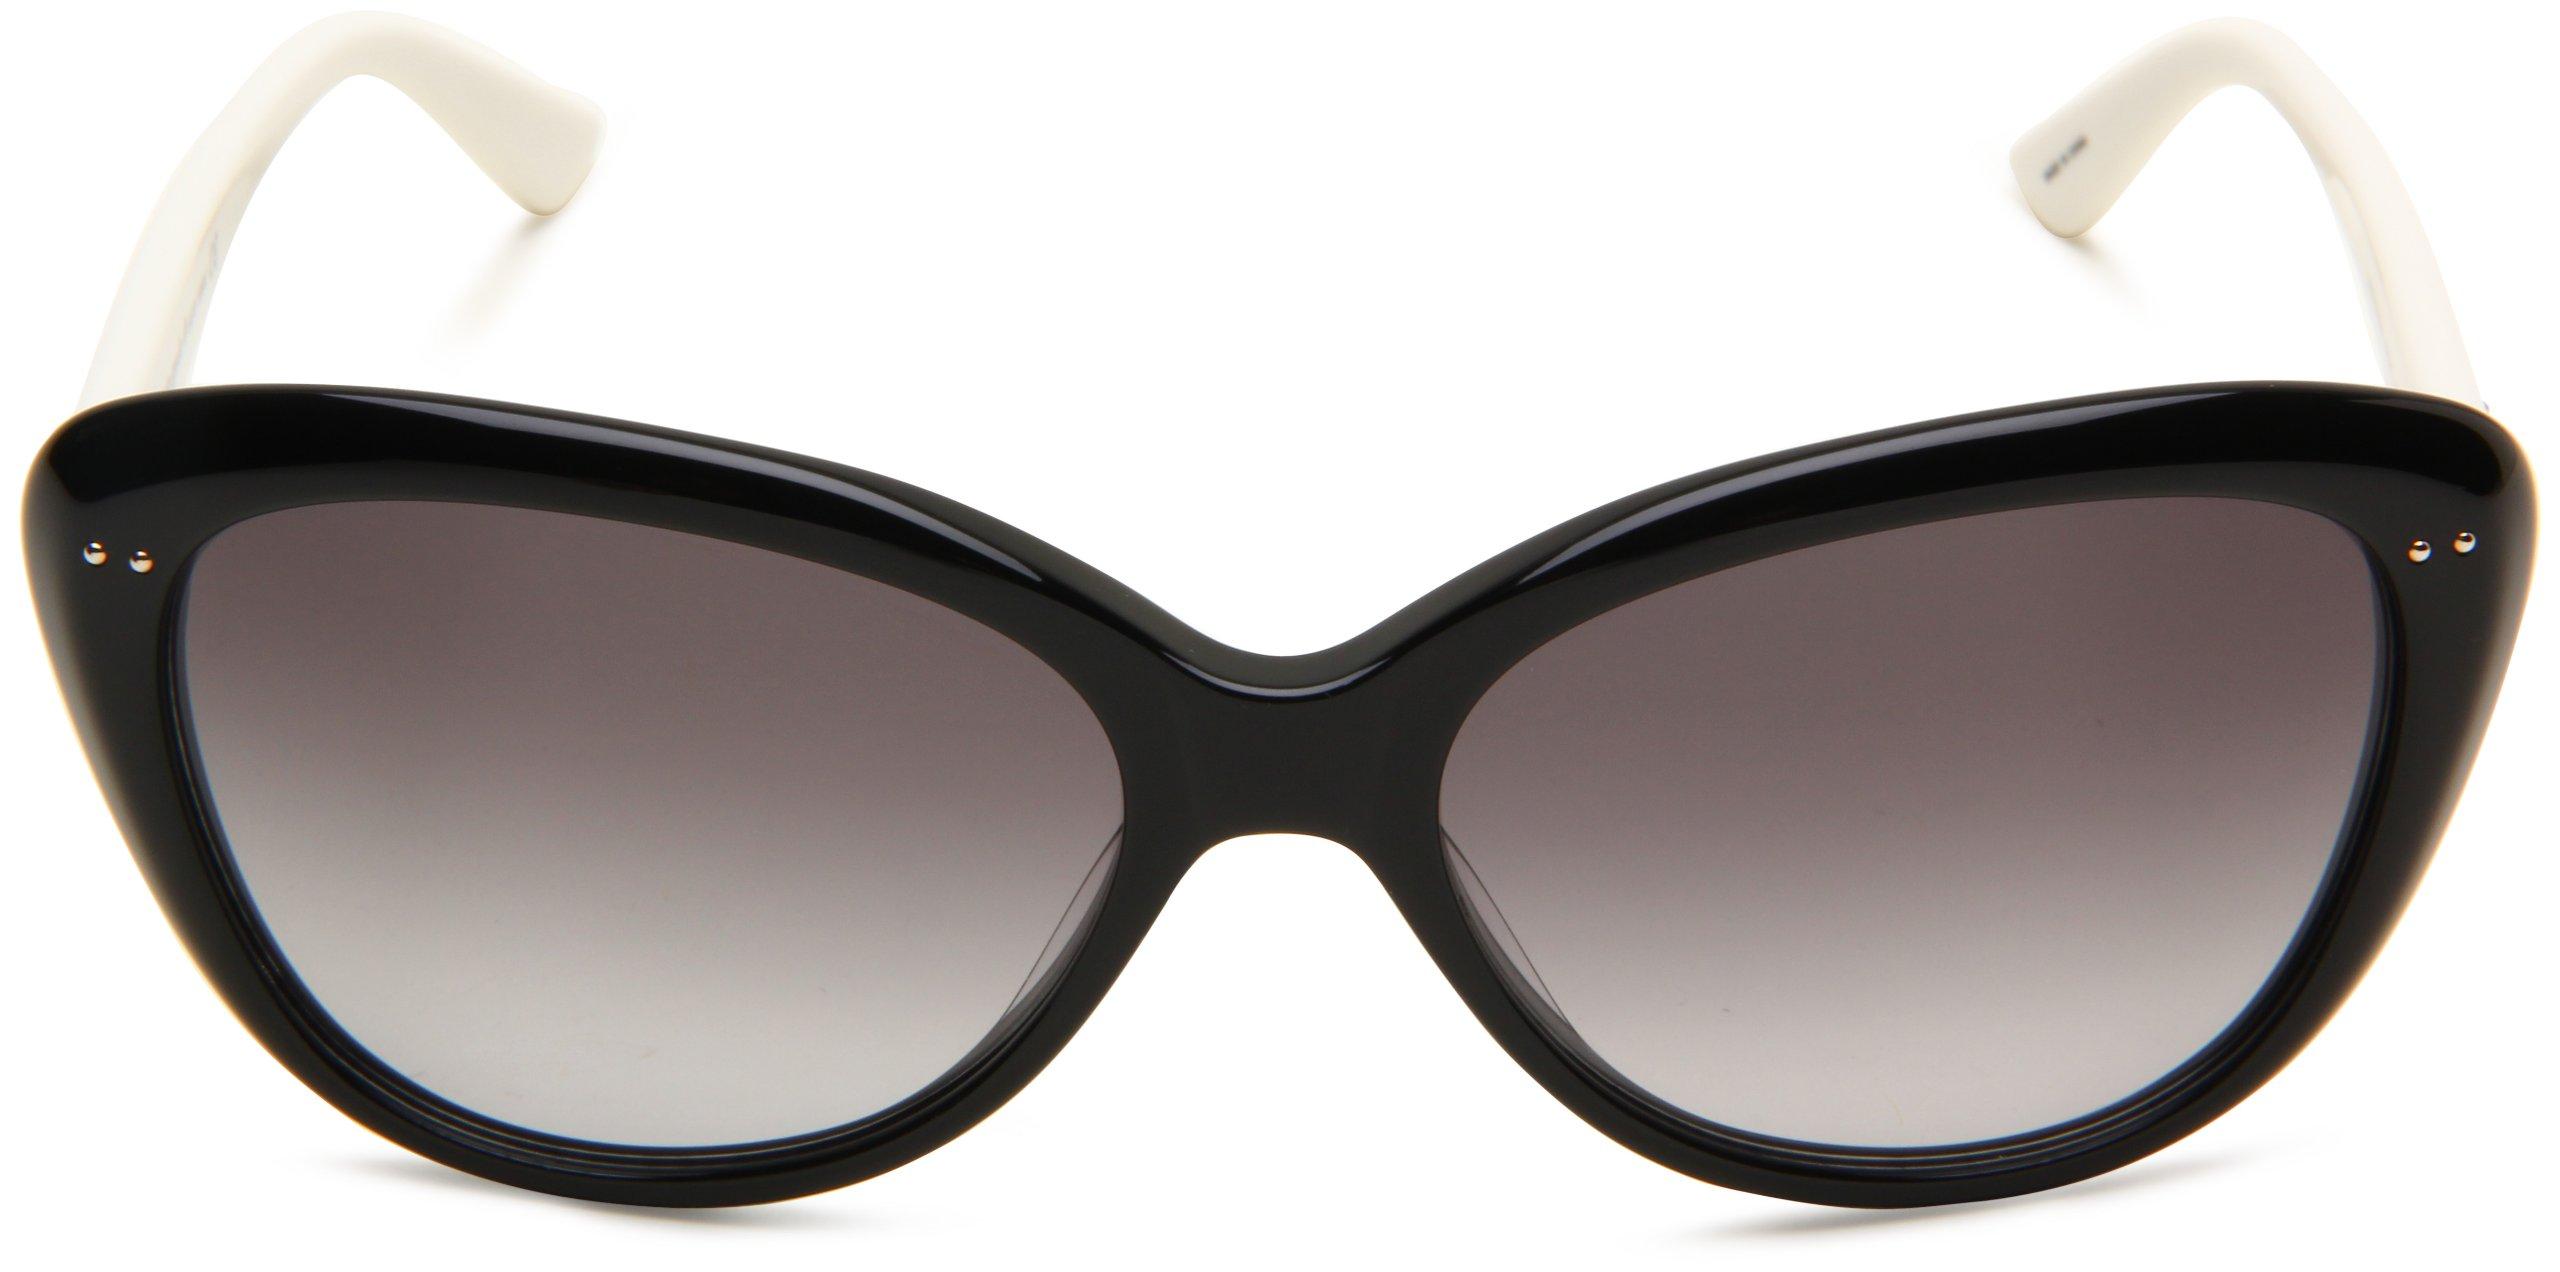 Kate Spade Women's ANGELIQS Cat Eye Sunglasses,Black & Cream Frame/Gray Gradient Lens,One Size by Kate Spade New York (Image #2)